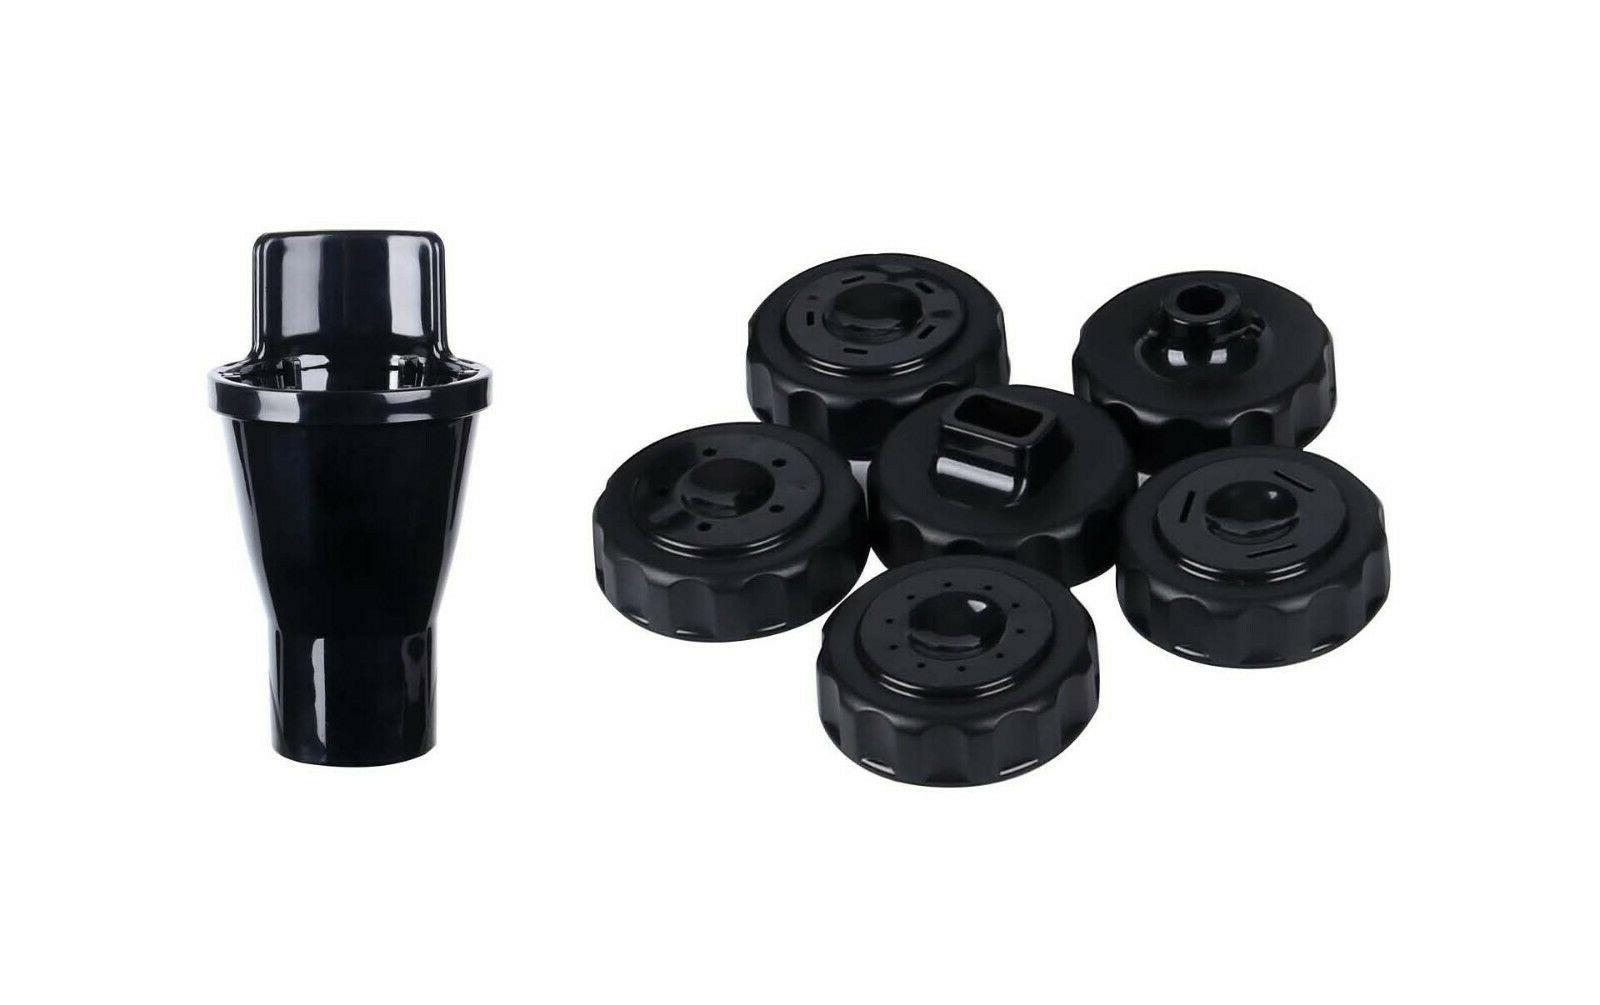 Koldpresse Accessories Parts NEW - Cold Horizontal Slow Juicer